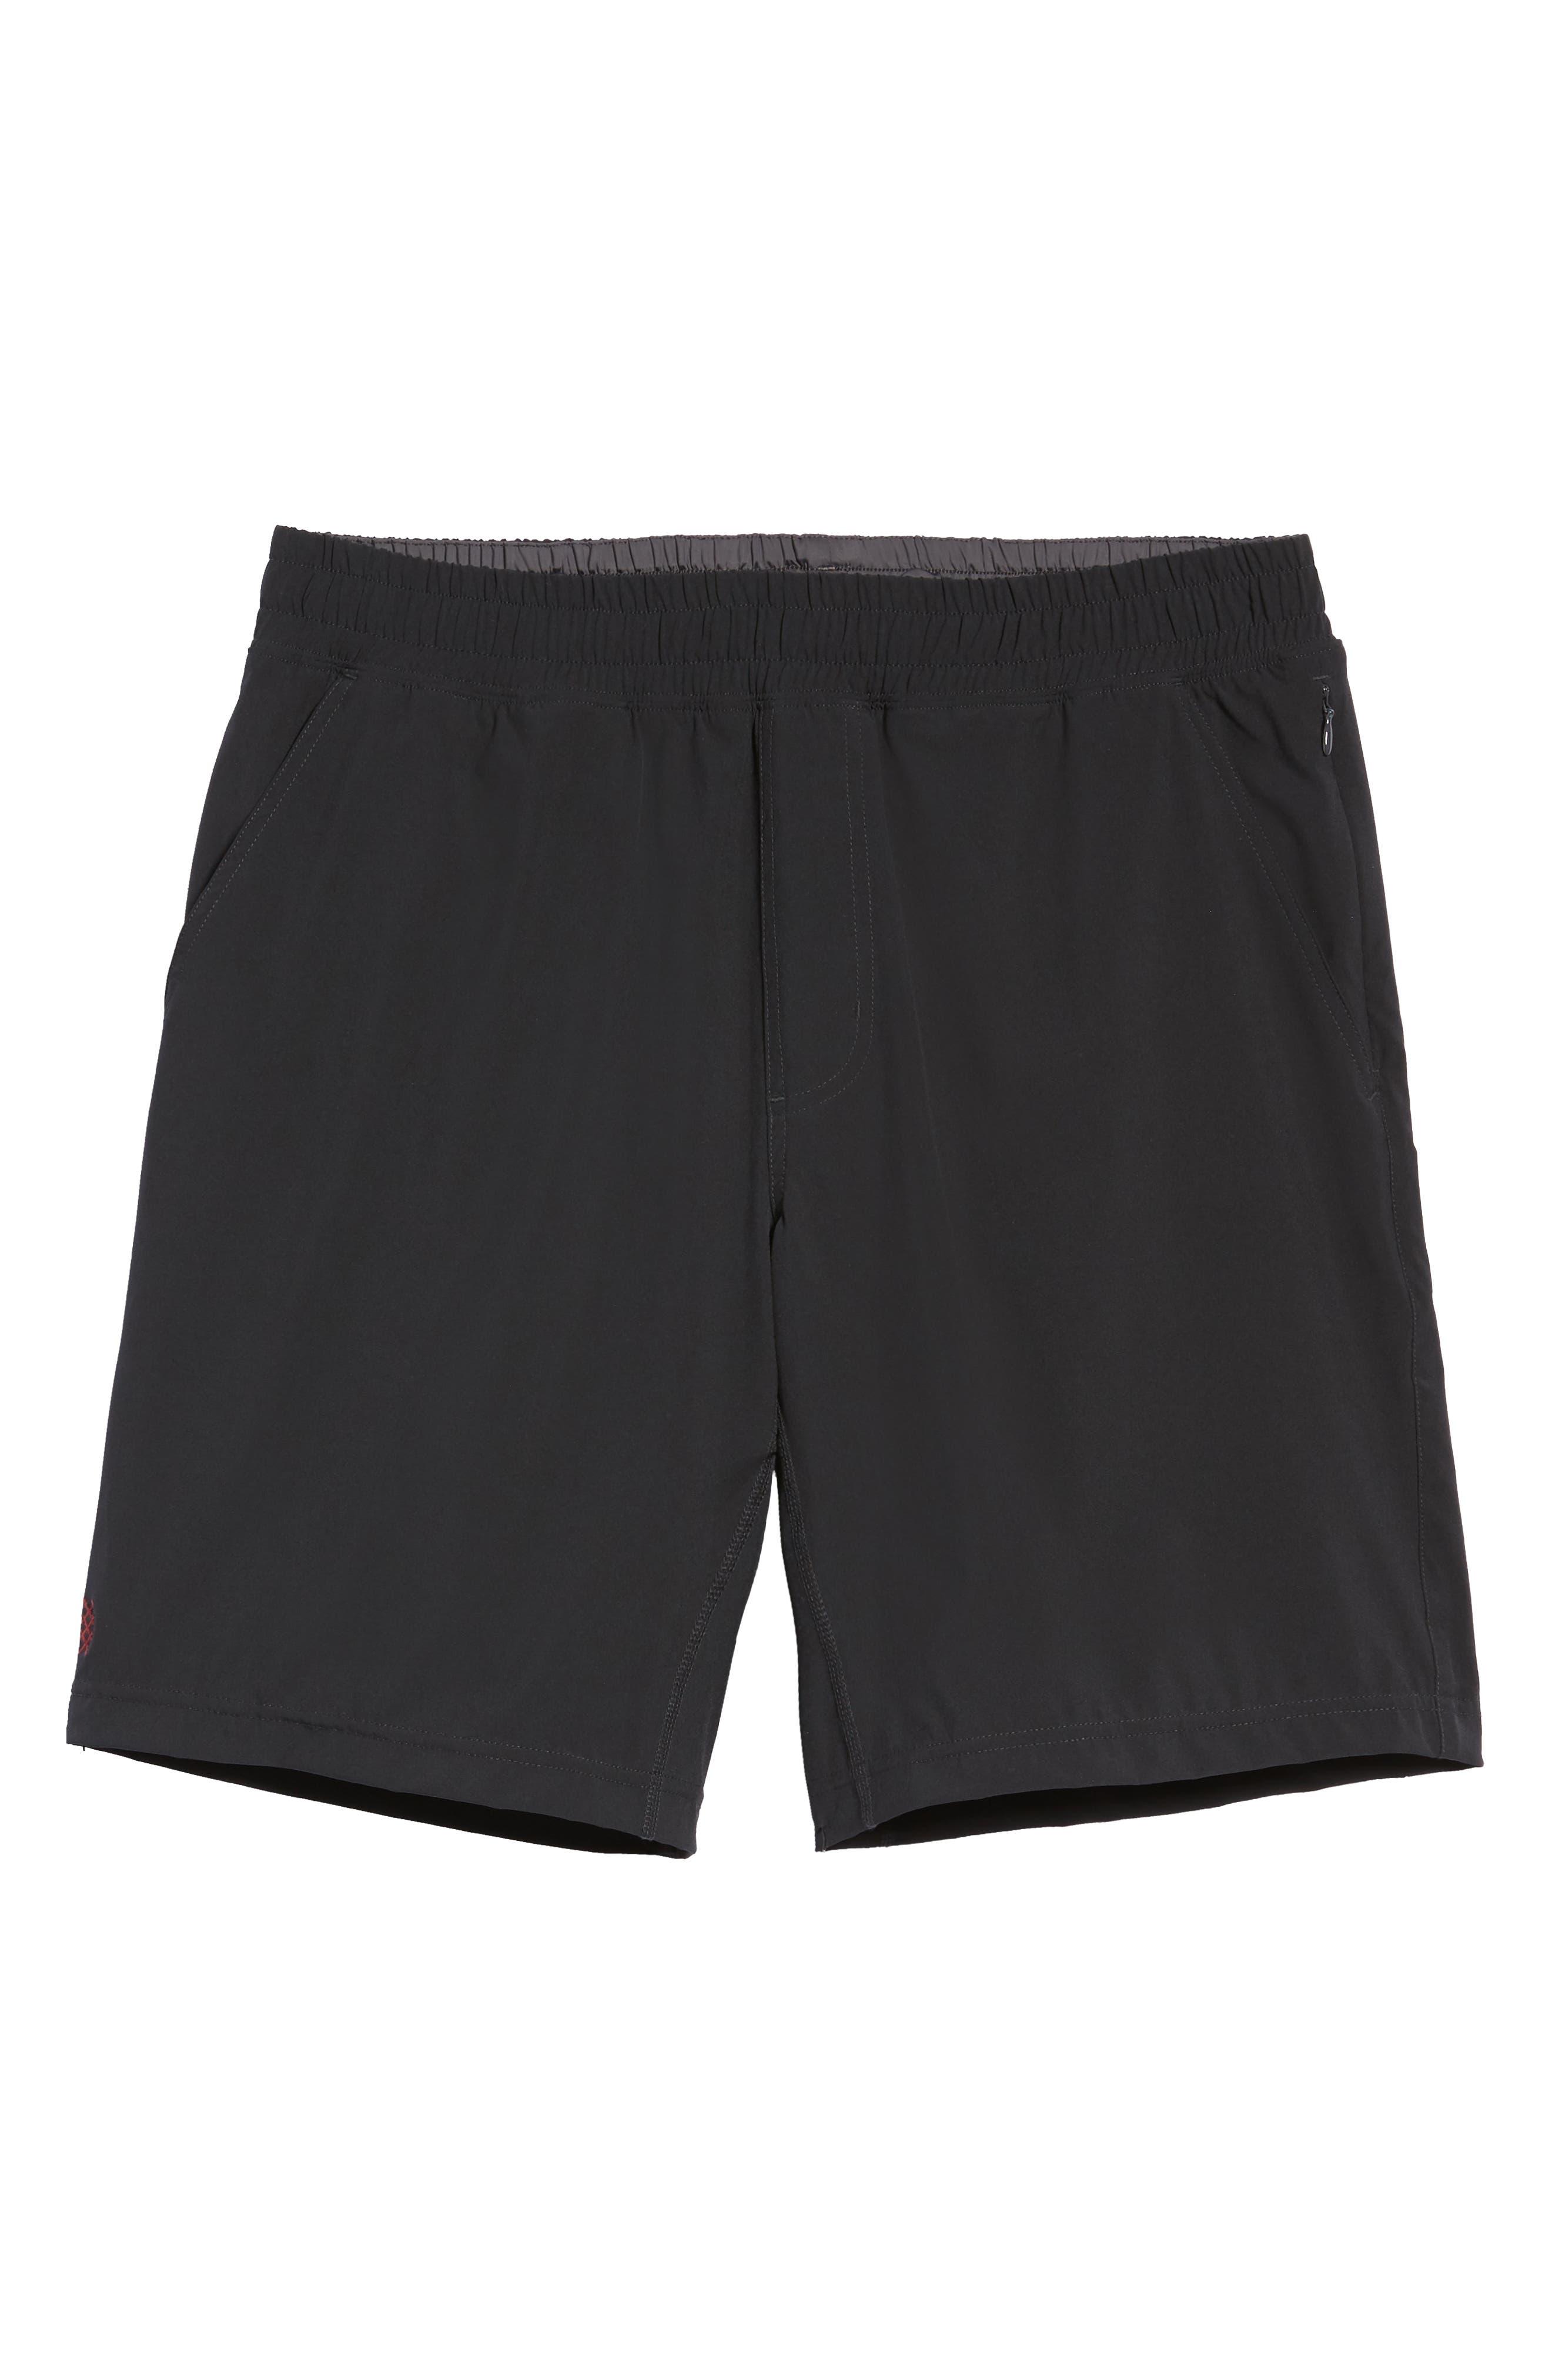 RHONE, Mako Lined Shorts, Alternate thumbnail 6, color, BLACK